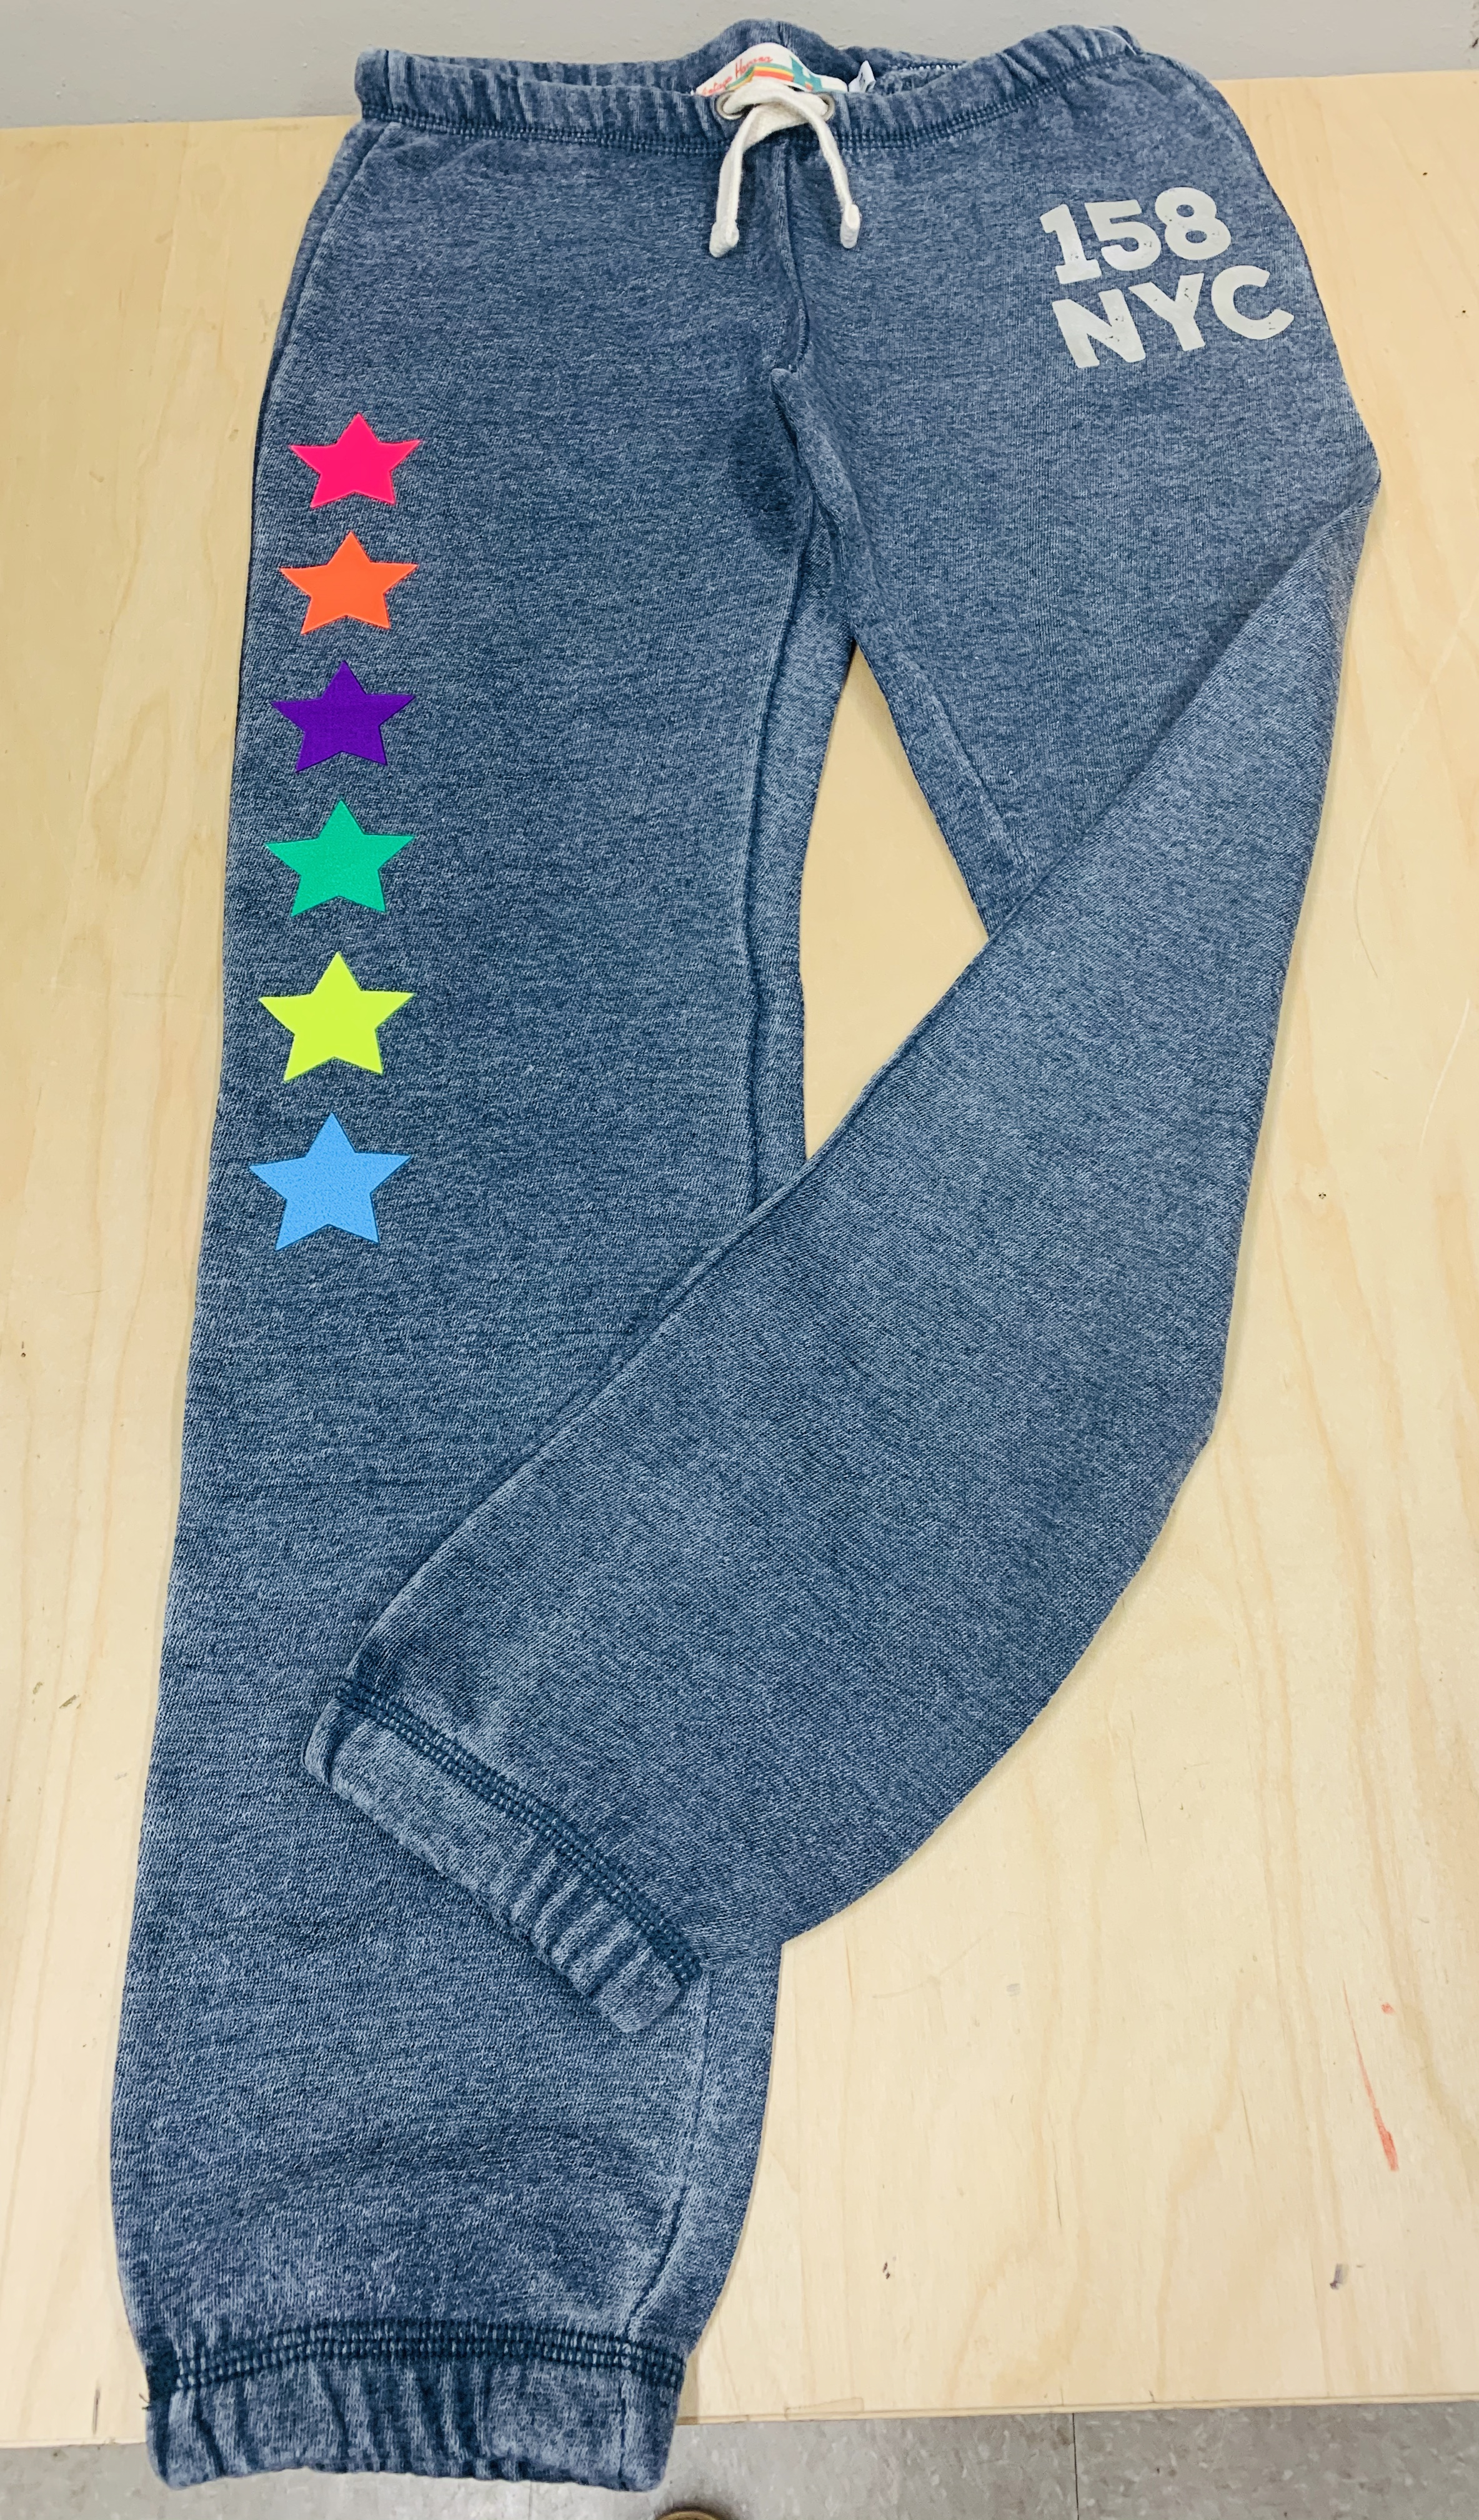 Sweatpants - Blue w/ Stars - Youth